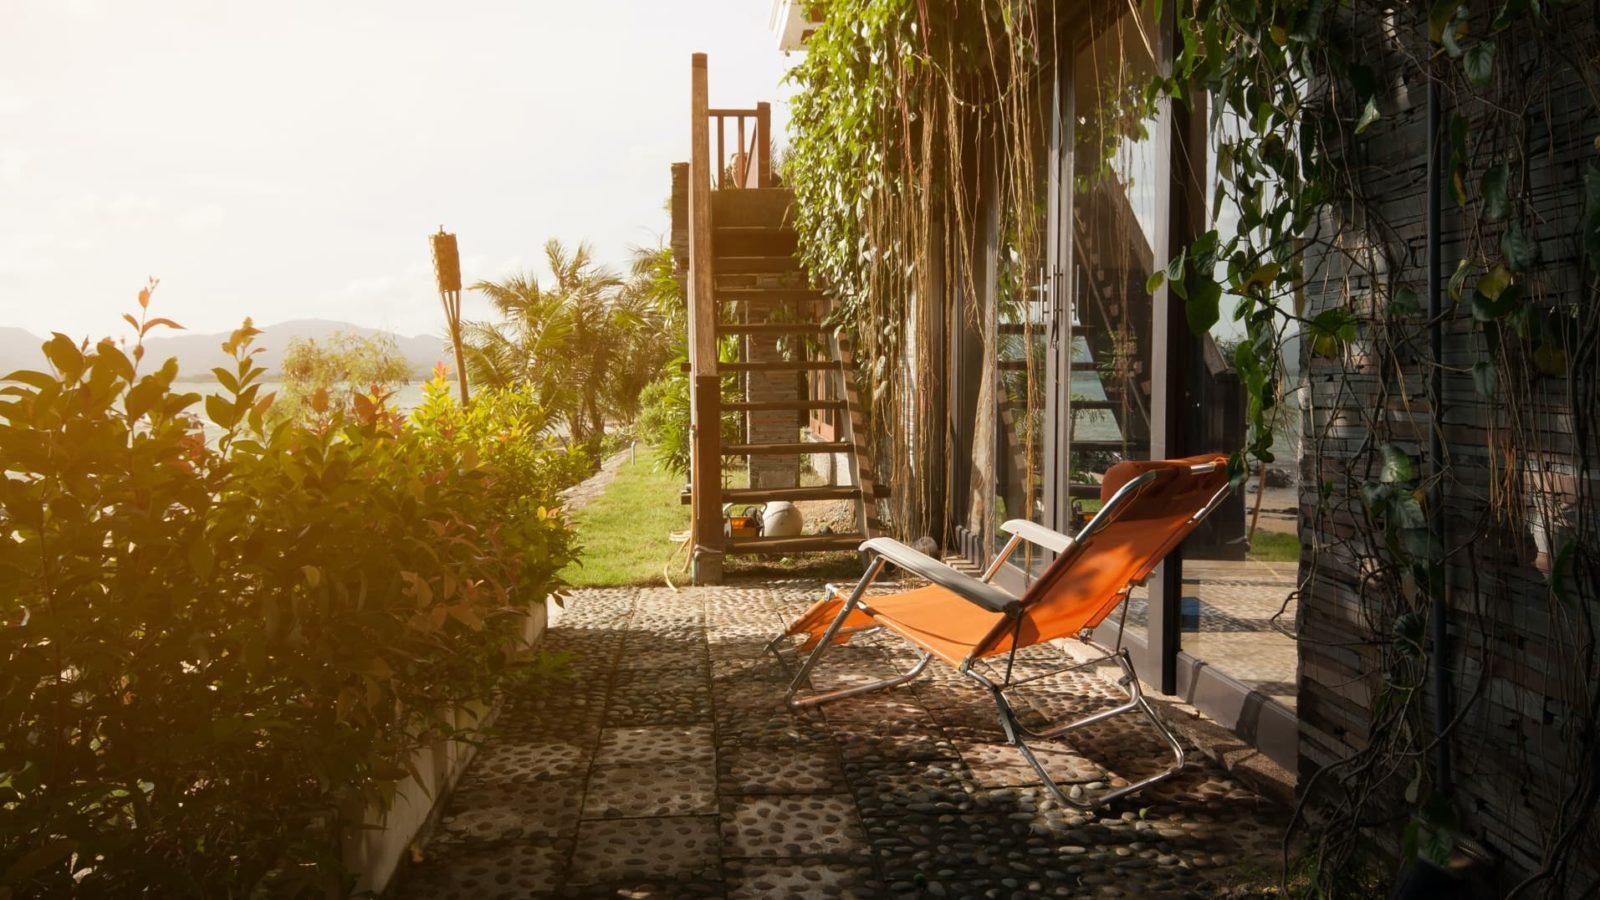 zero gravity chair sat on an outdoor patio area